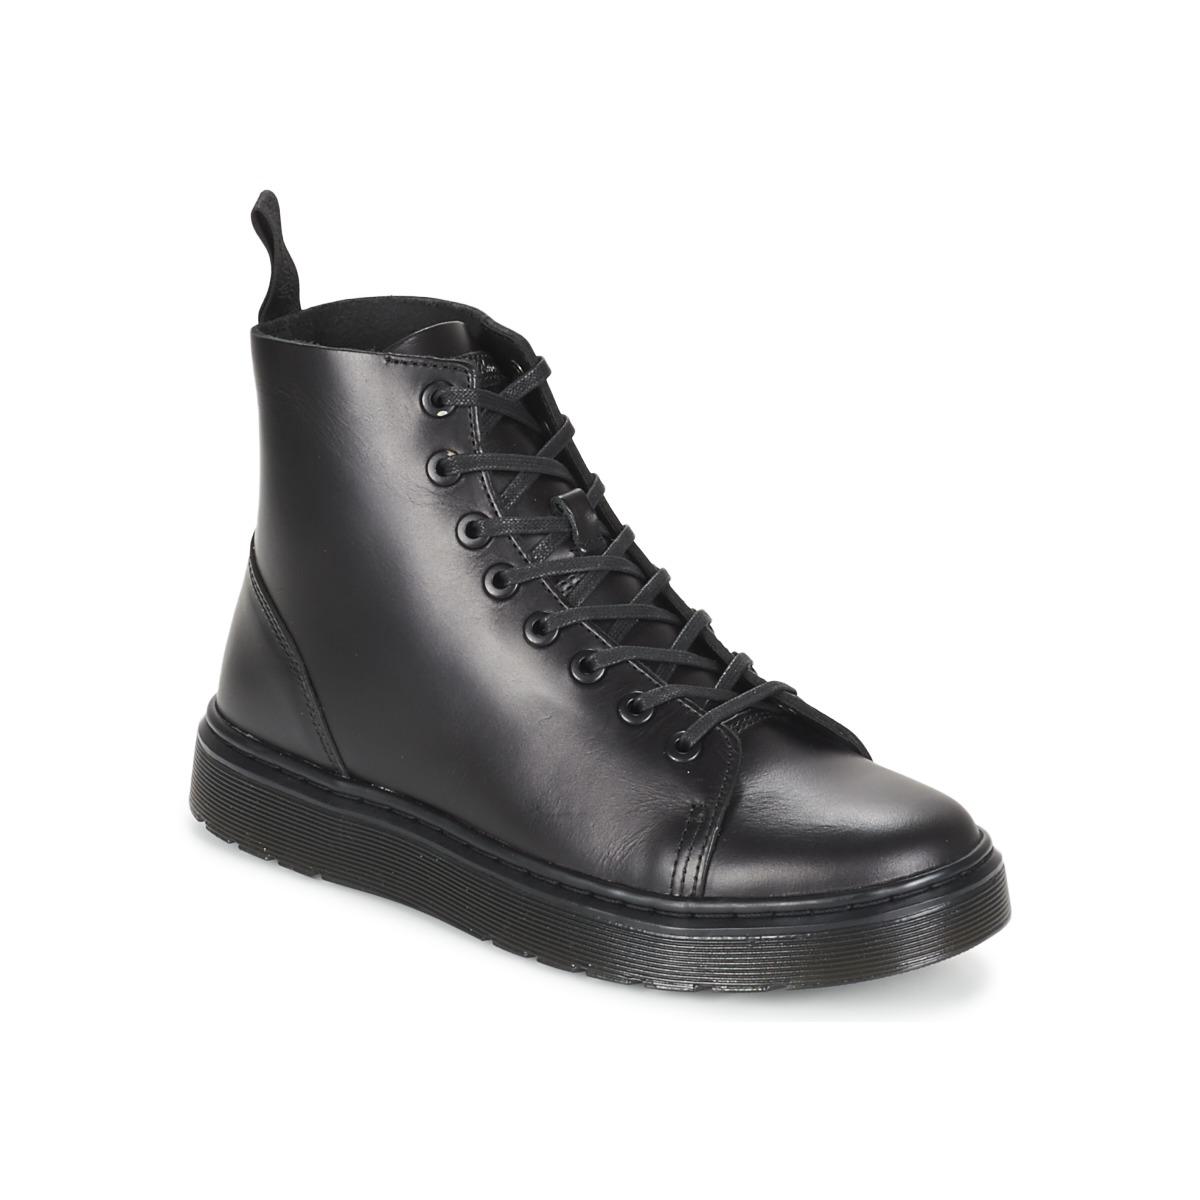 Gagnant Vans Skate Style 112 Mid Pro s Footwear Dakota